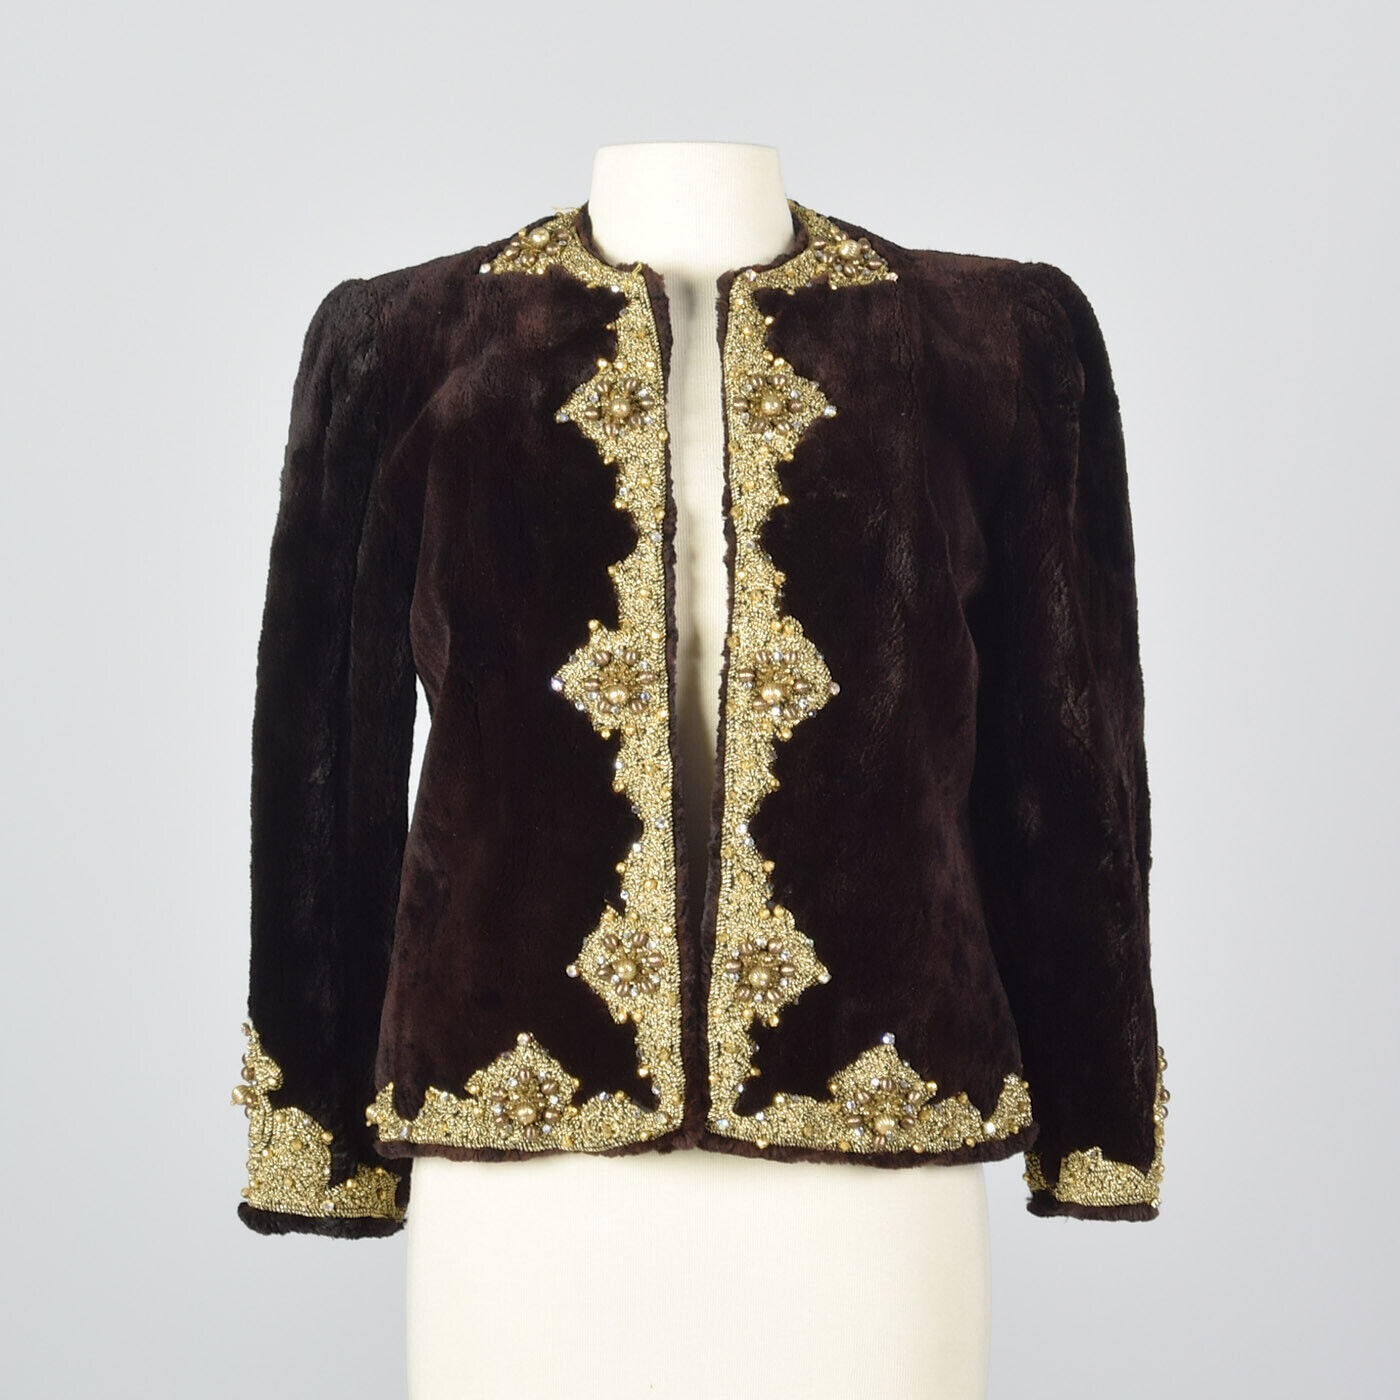 Oscar de la Renta Formal Evening Jacket Sheared Fur Beaded Bolero Vintage 1970s